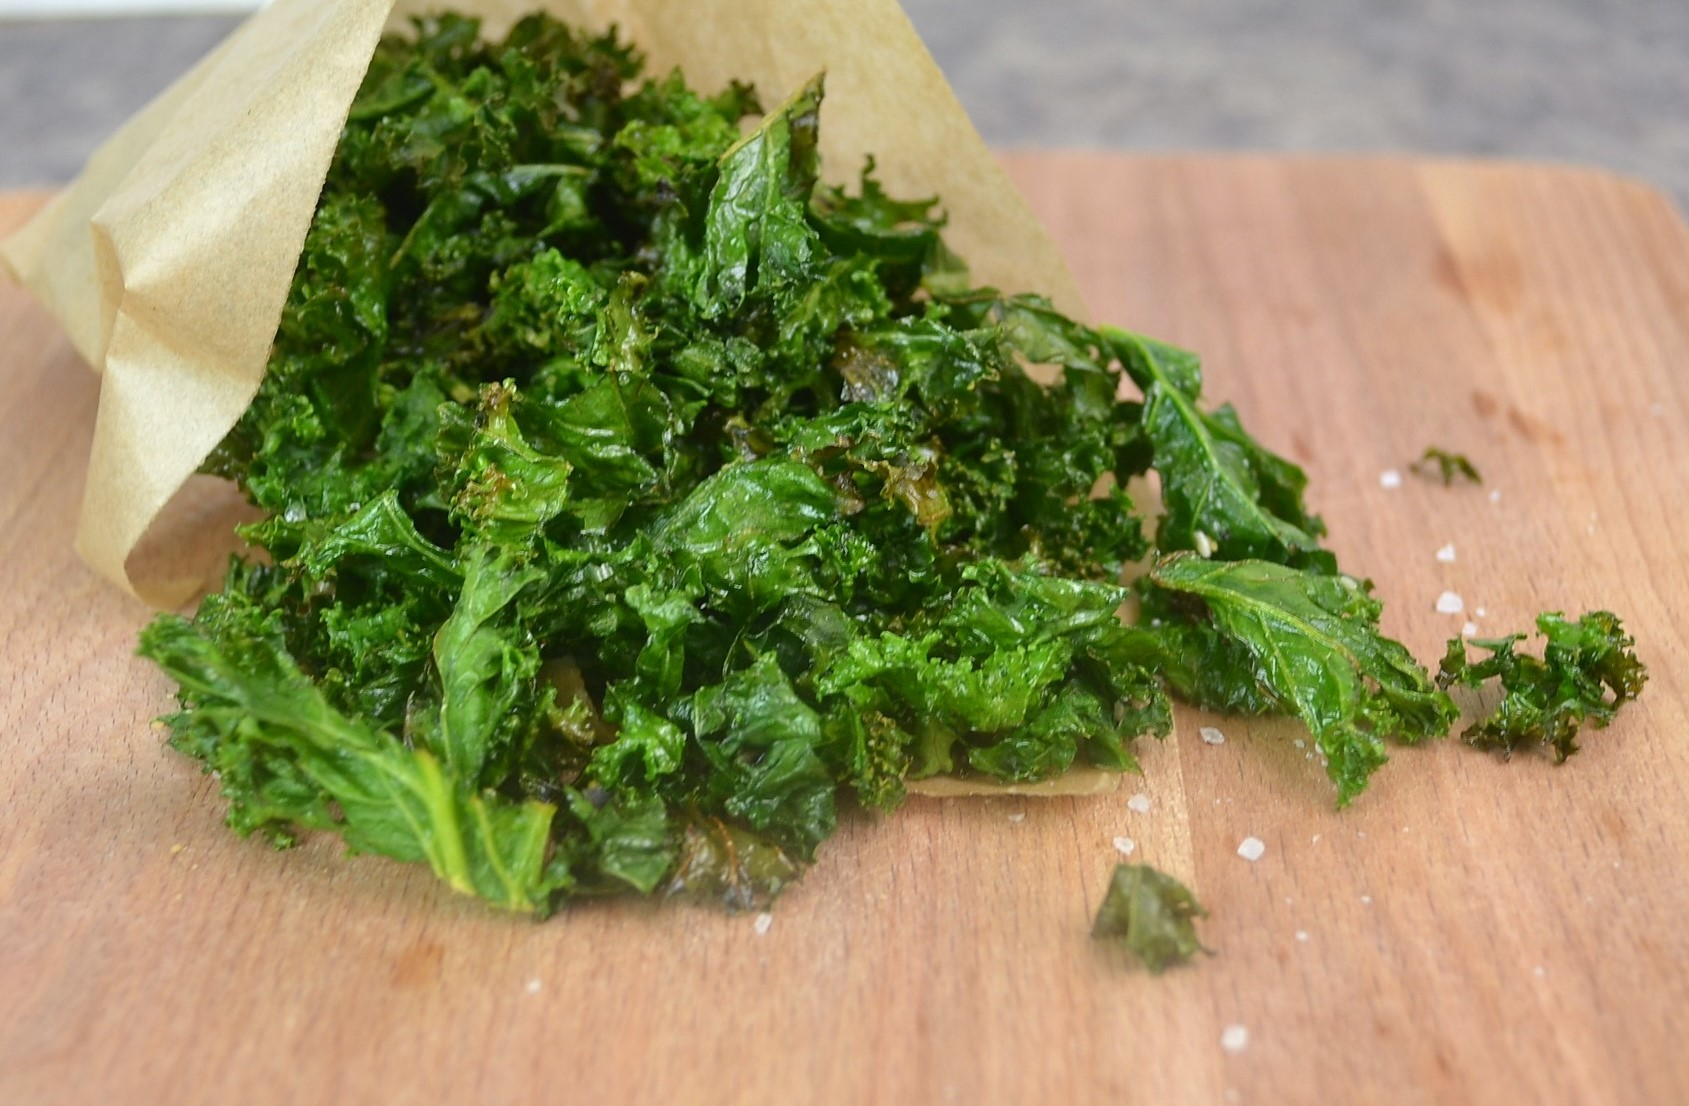 Kale Crisps Recipe | How to make kale crisps dontask4salt Vegetarian Snacks